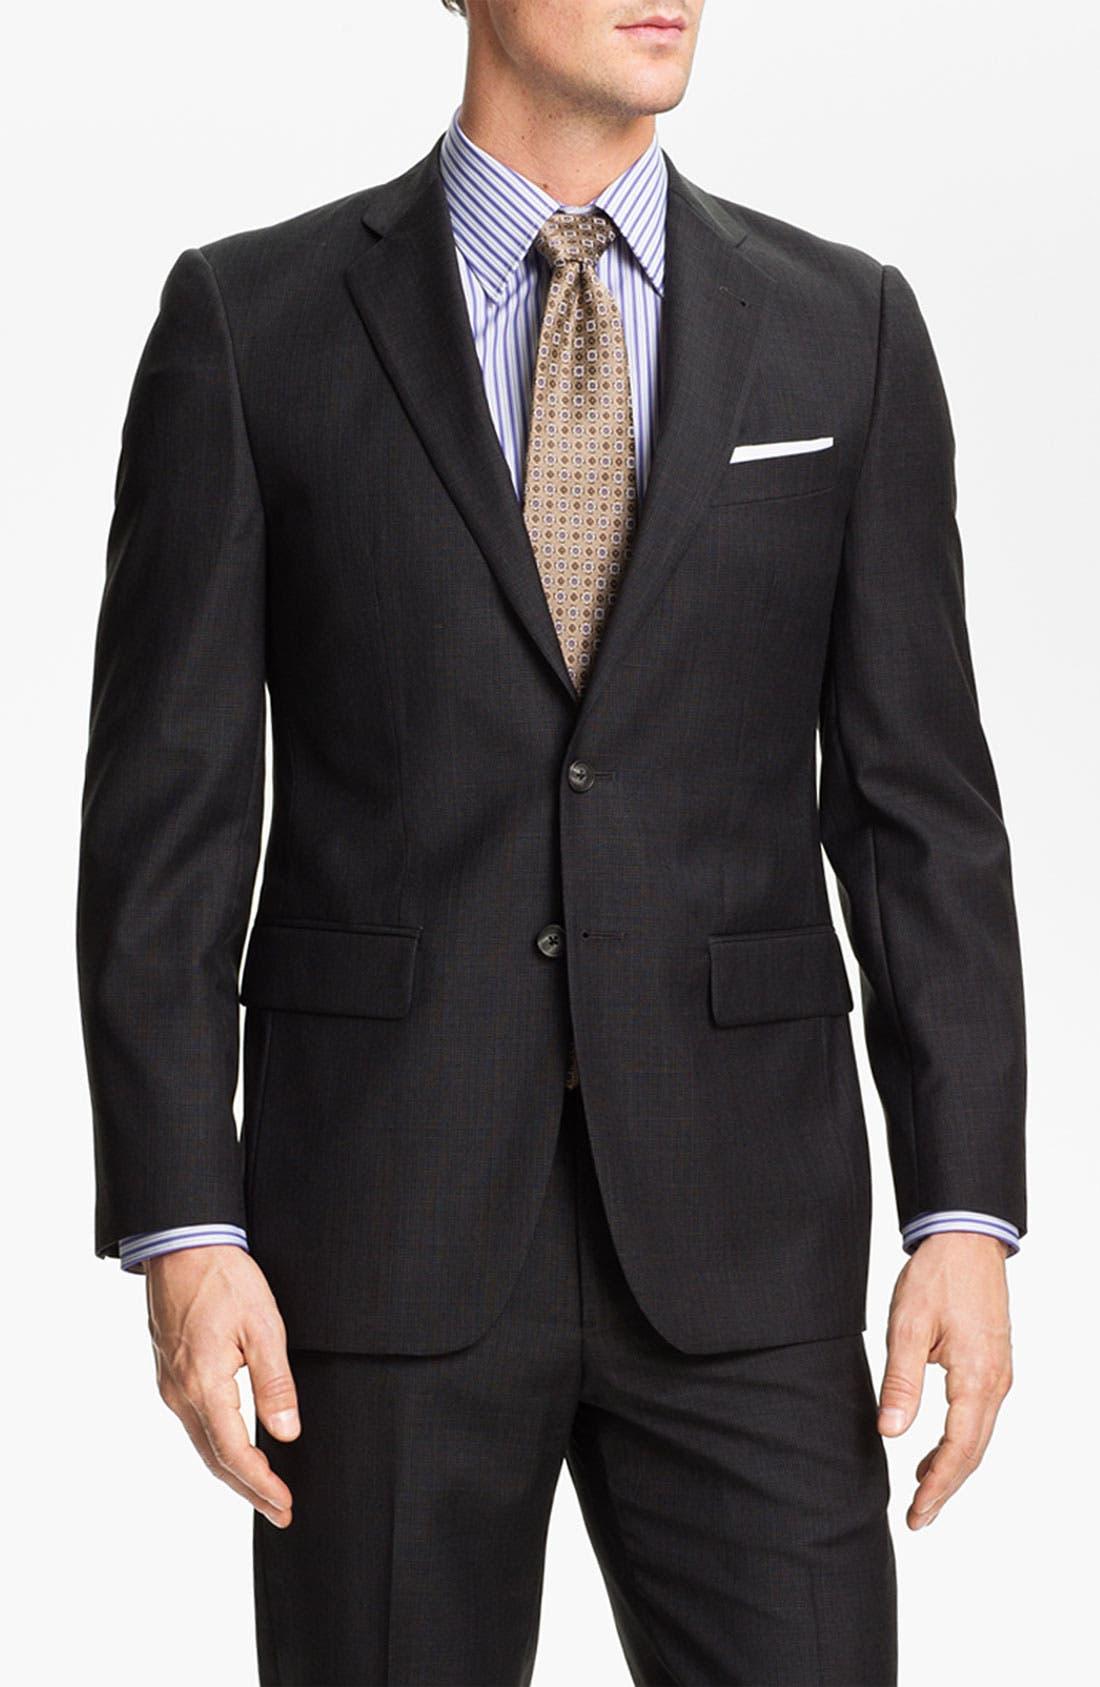 Alternate Image 1 Selected - Joseph Abboud Charcoal Plaid Wool Suit